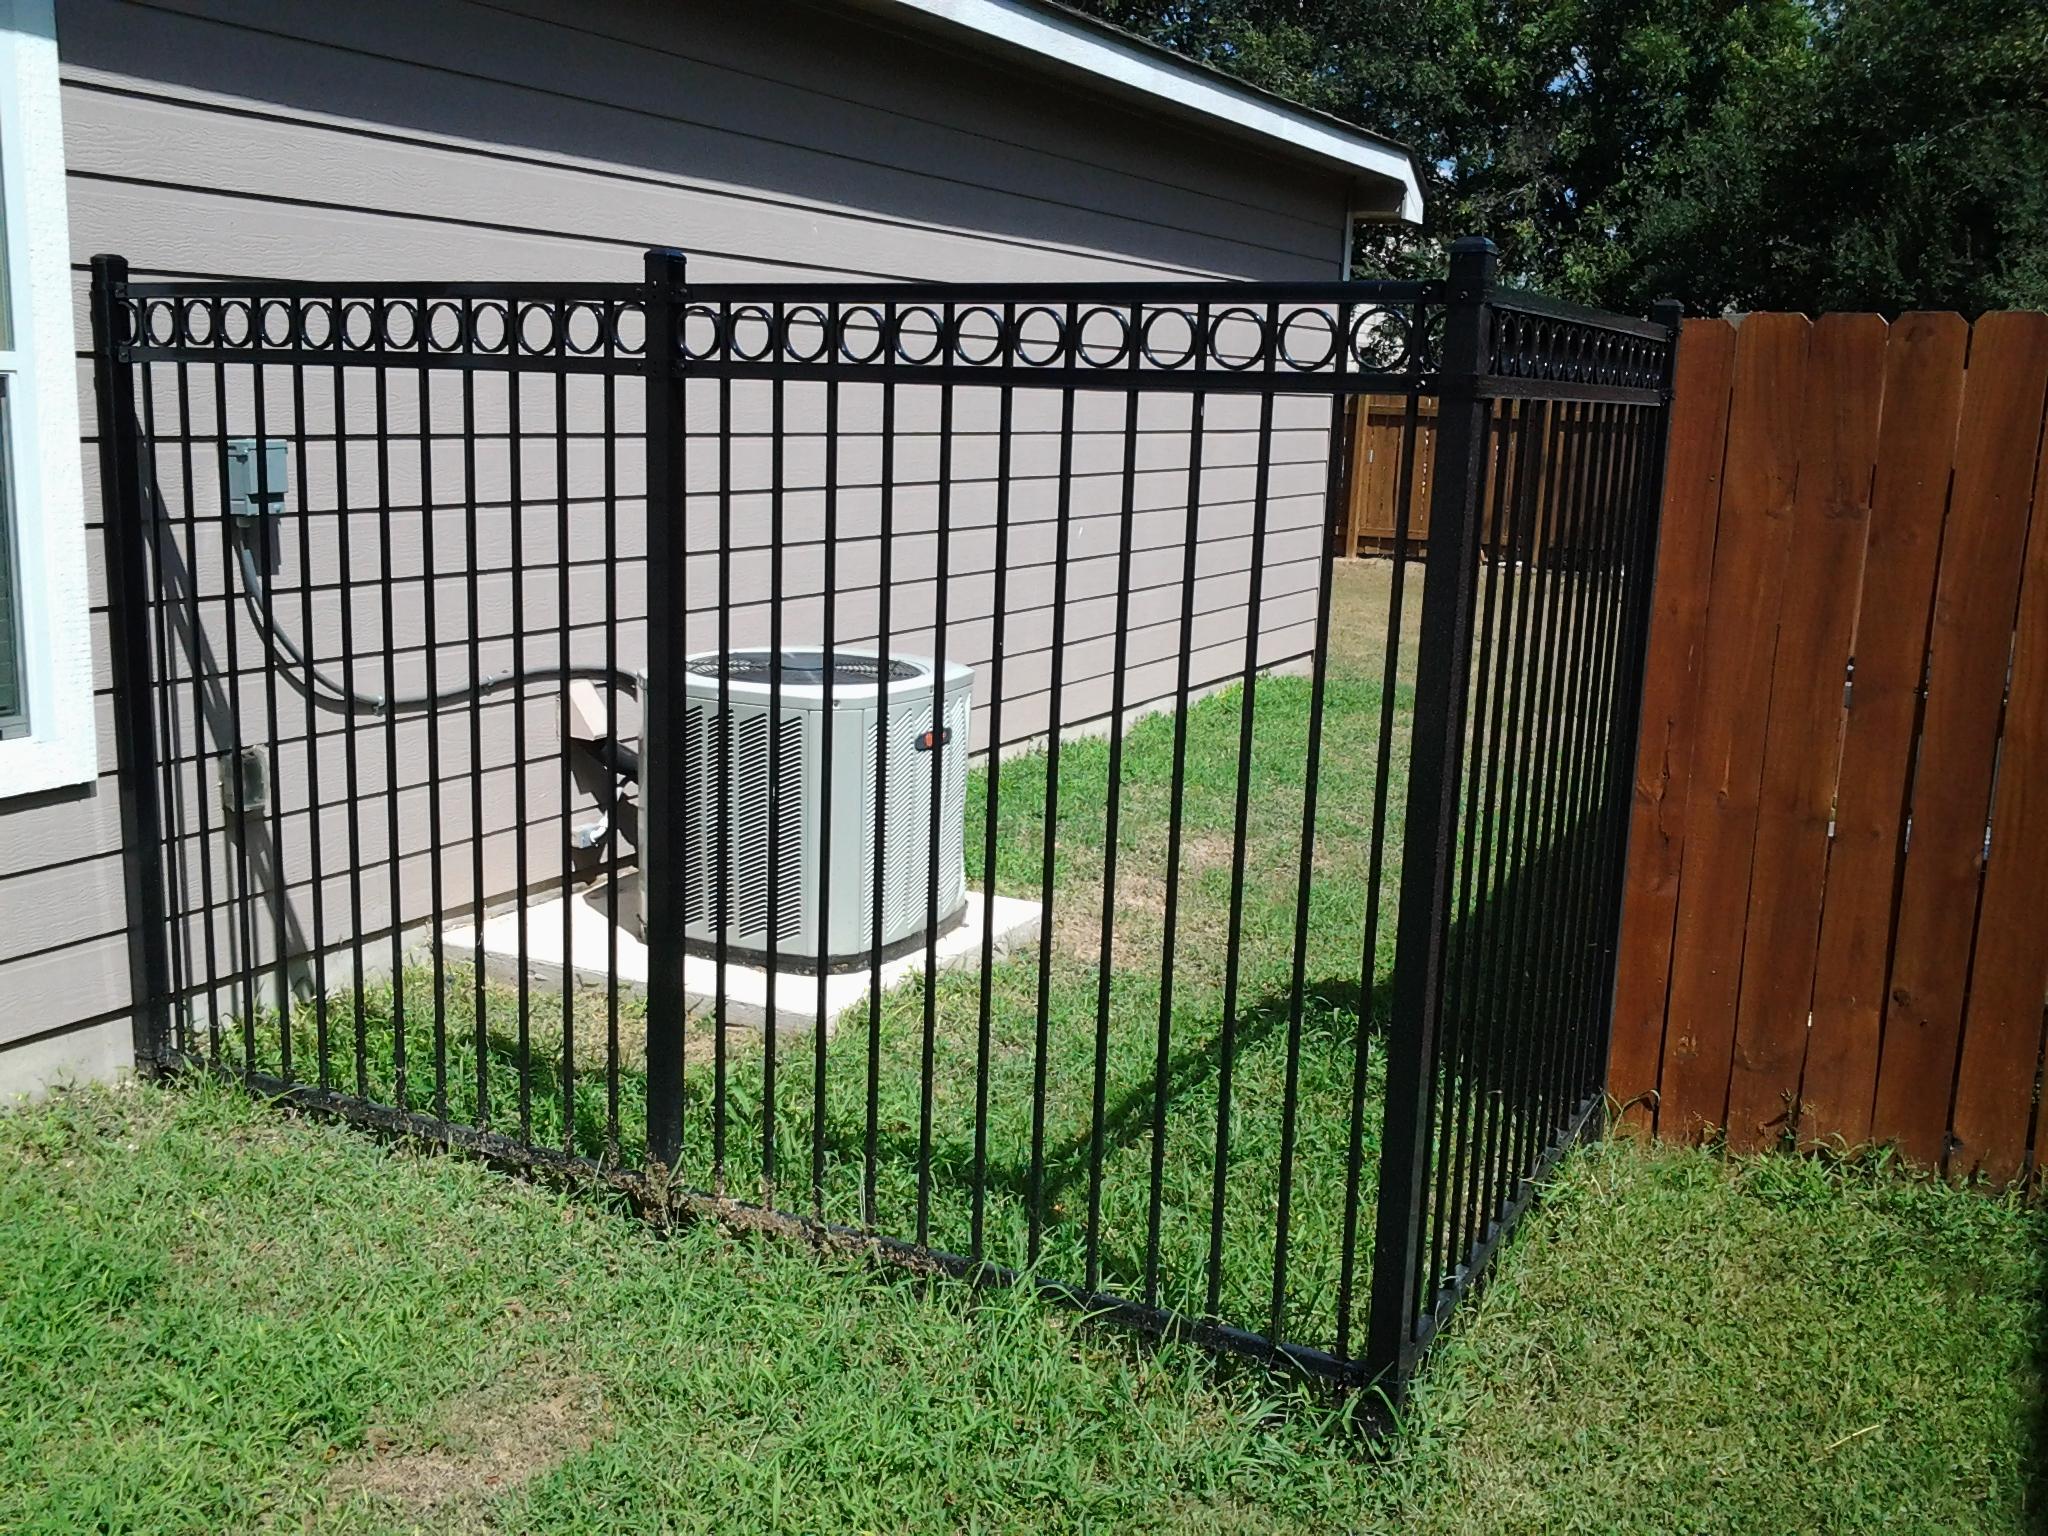 City Fence Co Of San Antonio 4047 Stahl Rd Ste 2, San Antonio, TX ...